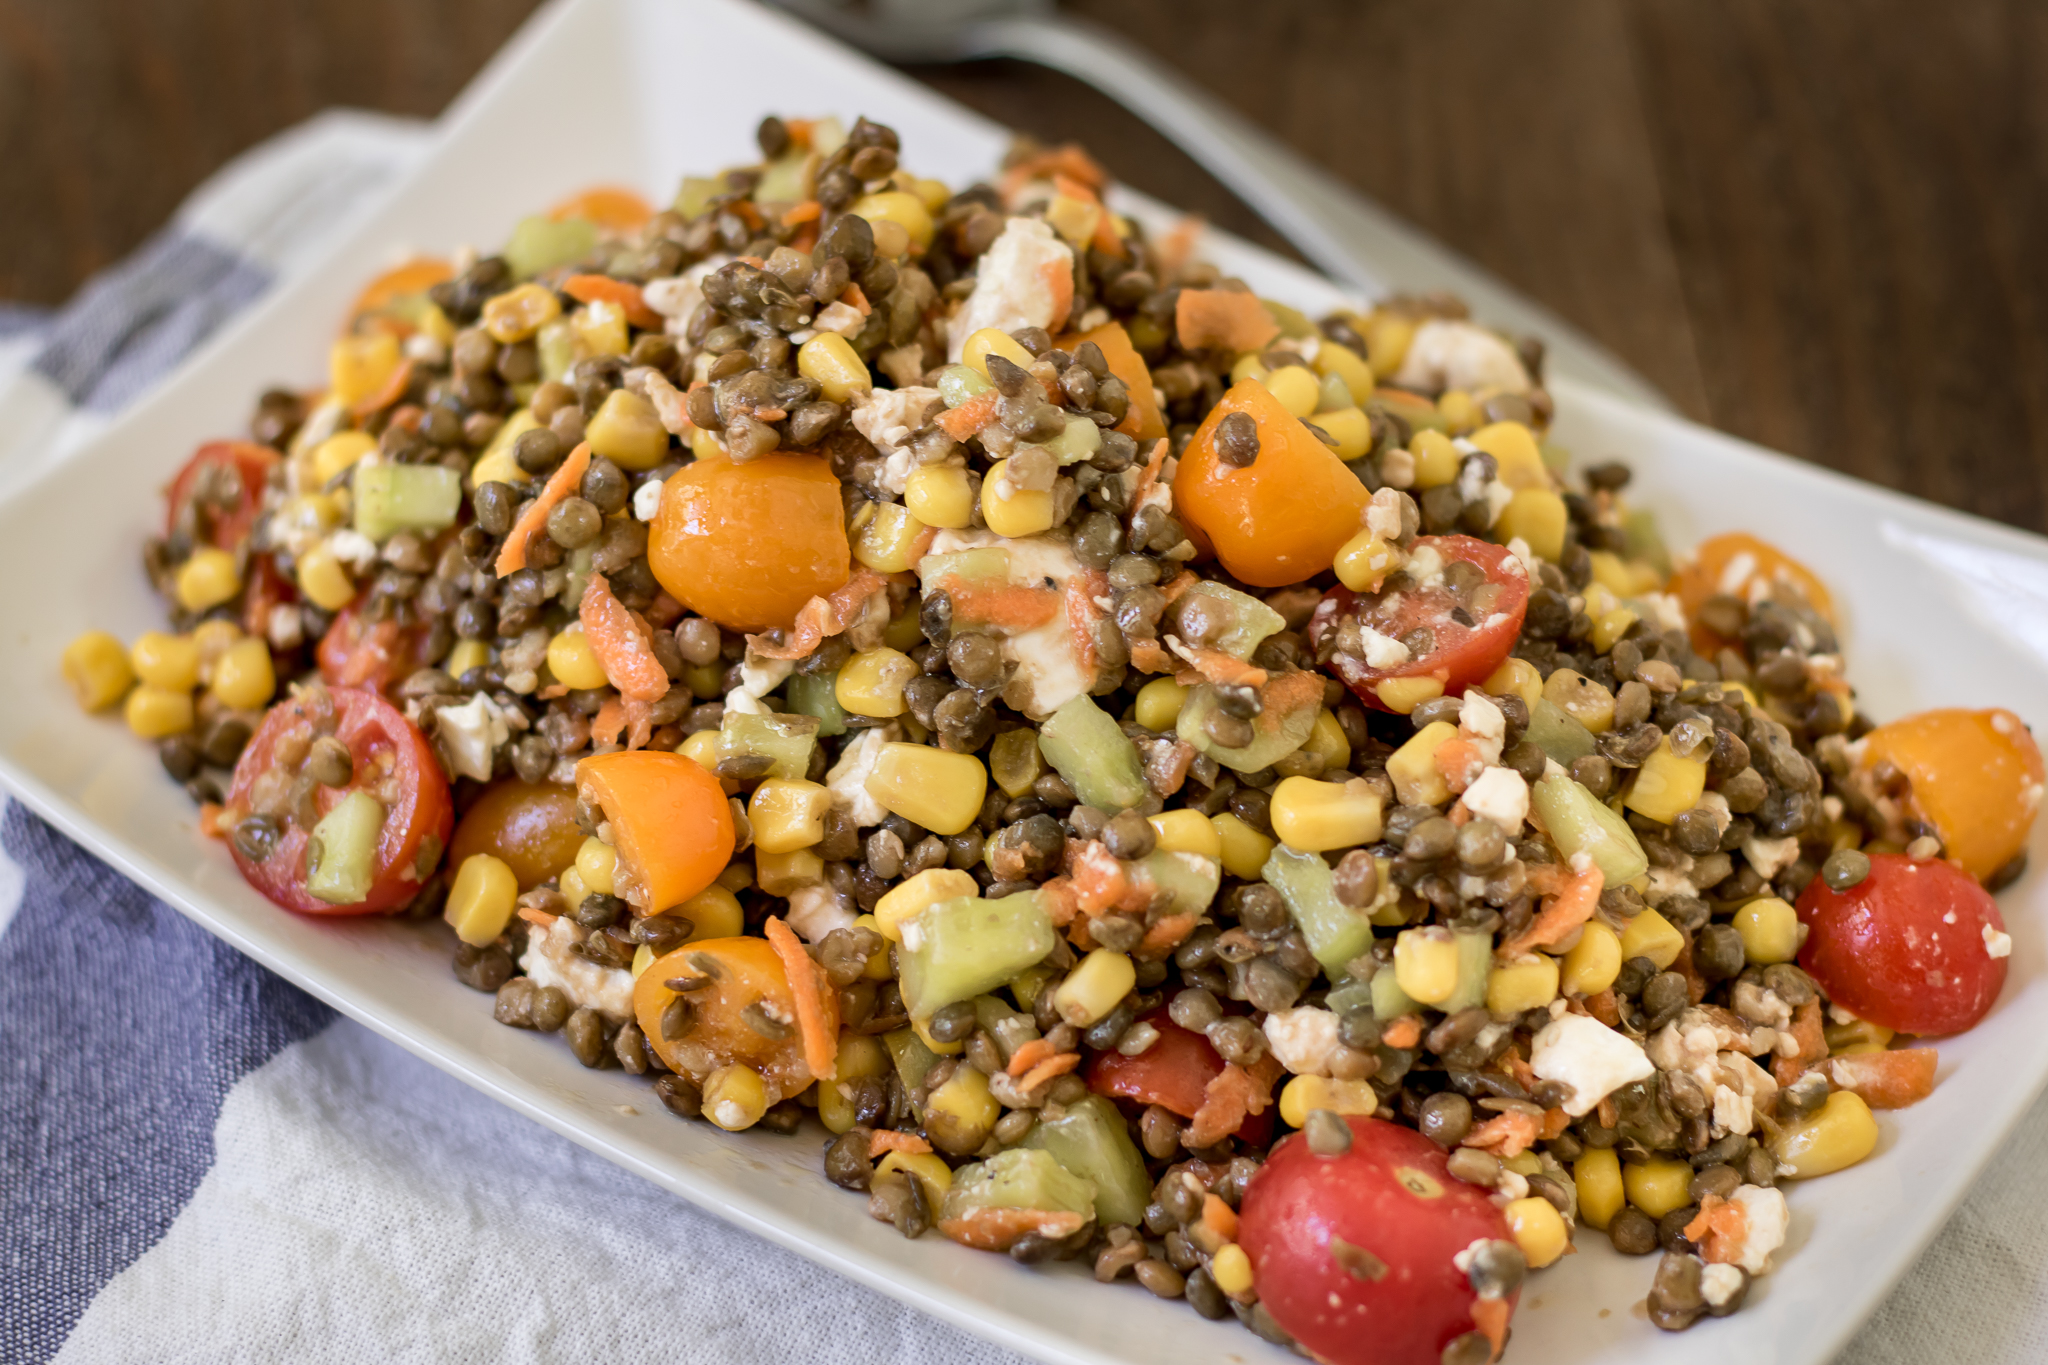 Easy, Delicious Corn & Lentil Salad Recipe